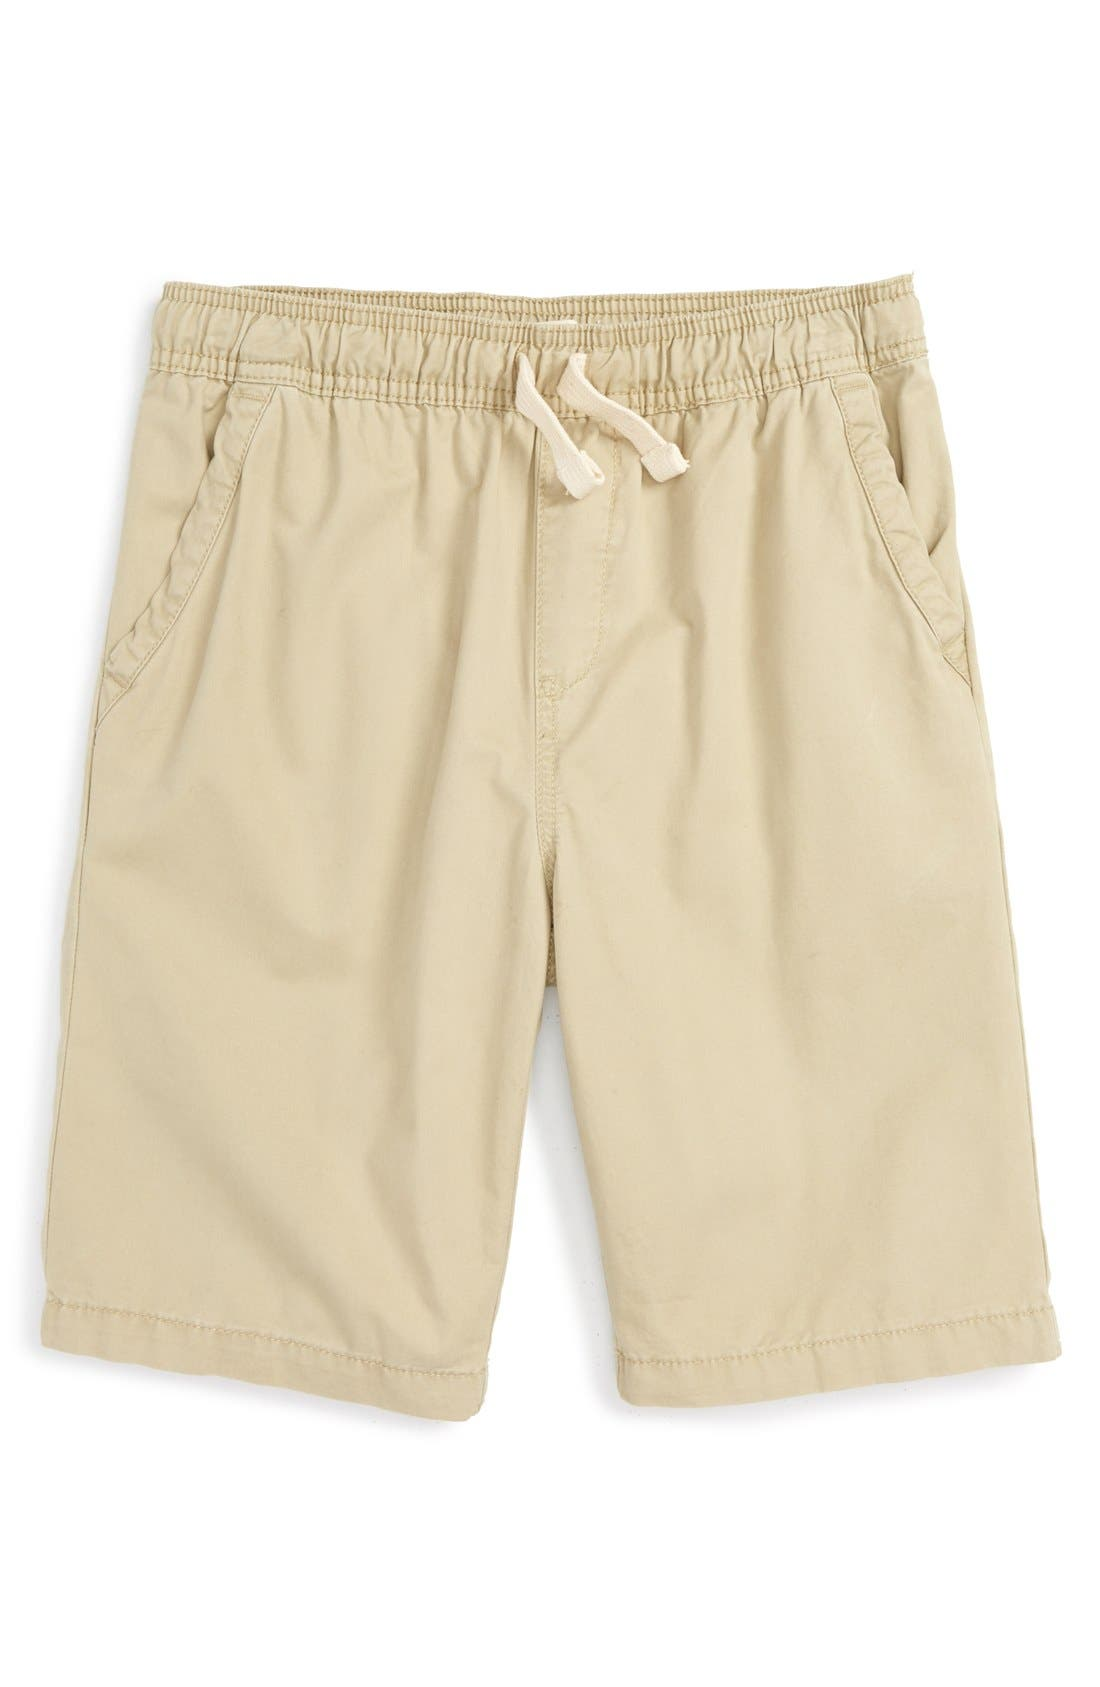 Main Image - Tucker + Tate Cotton Twill Shorts (Toddler Boys, Little Boys & Big Boys)